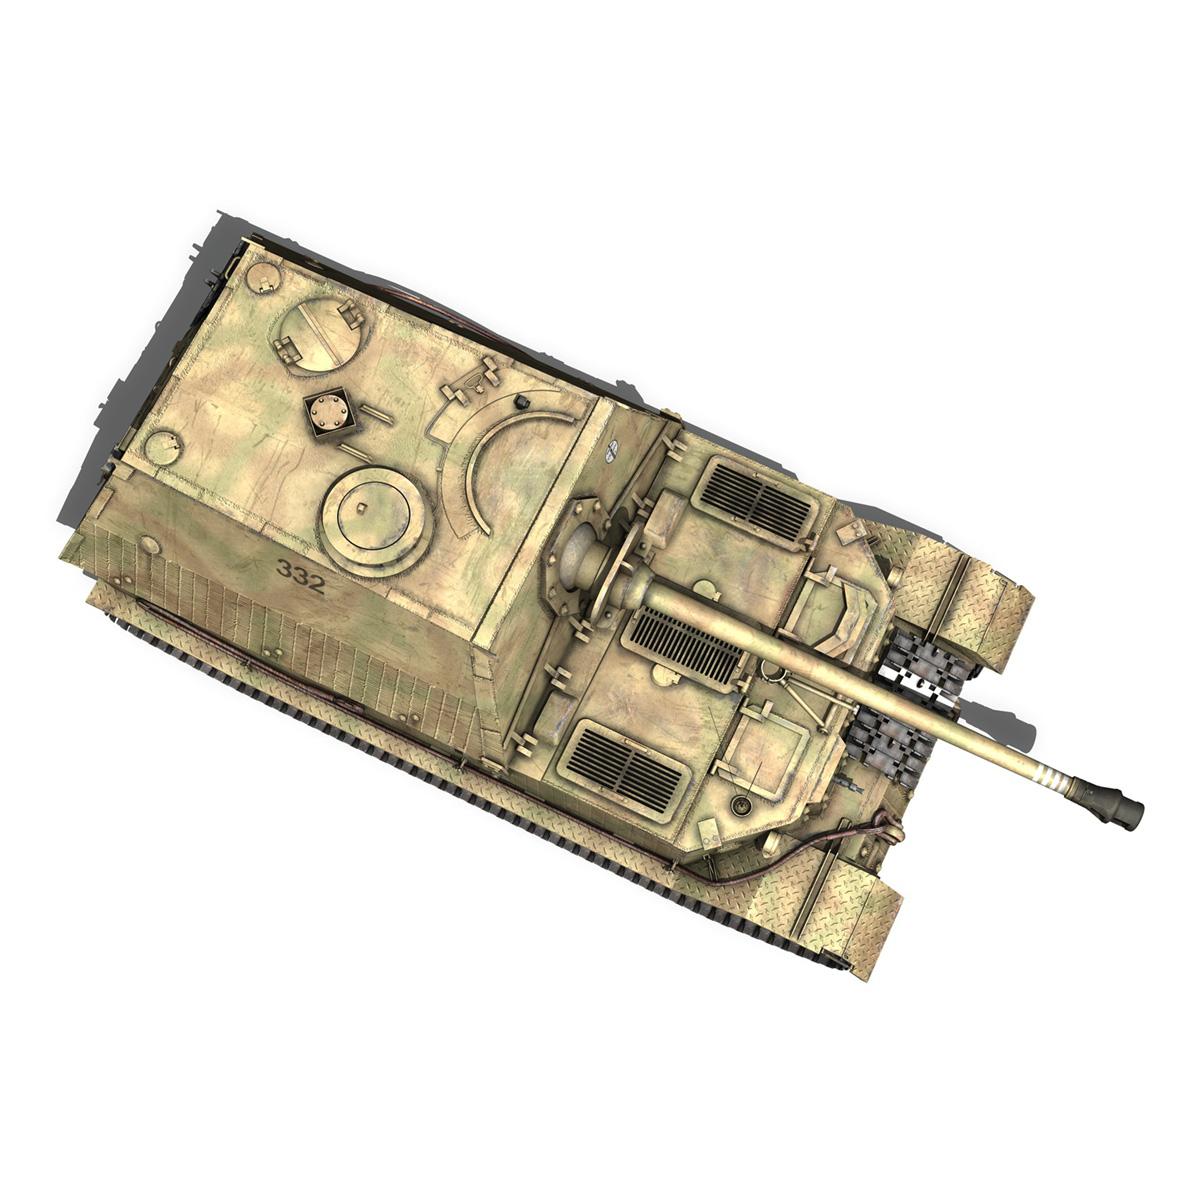 Tiger Tank Interior Model: SD.KFZ 184 Tank Destroyer Tiger (P) Elefant 3D Model